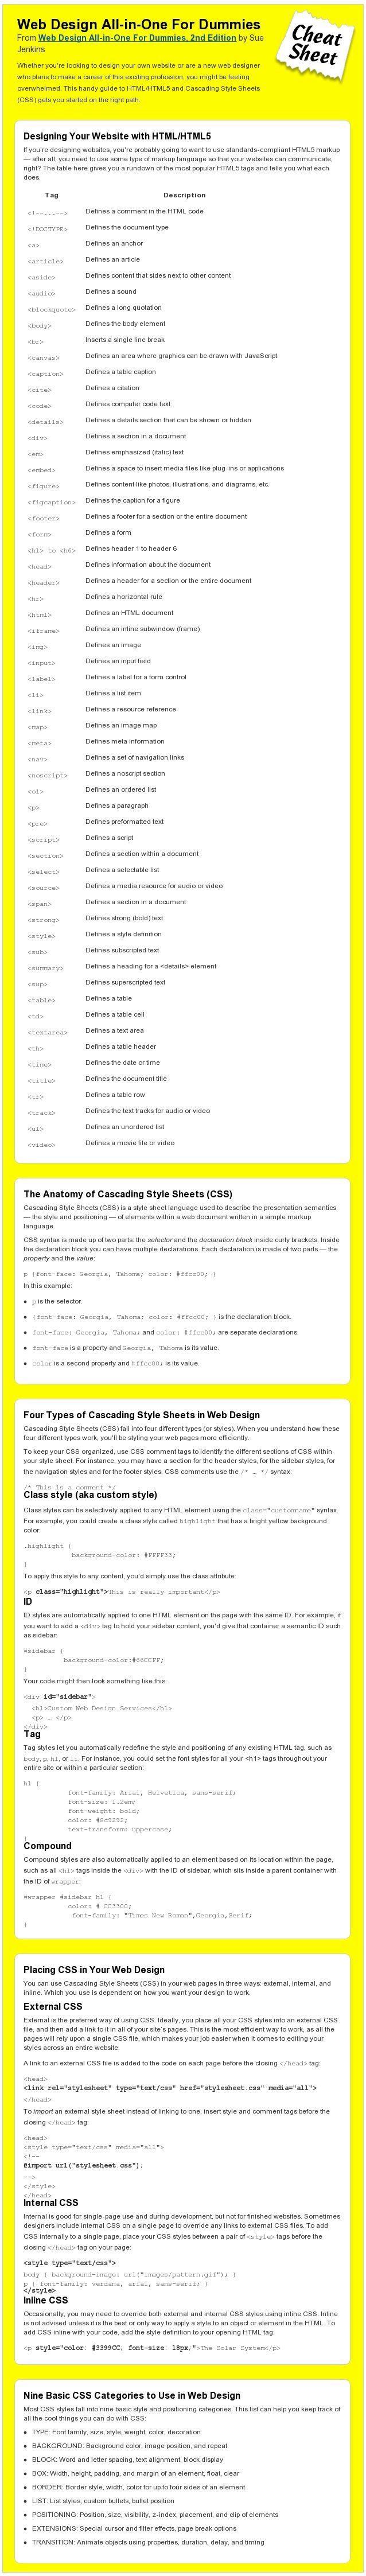 CSS Cheat Sheet for Dummies